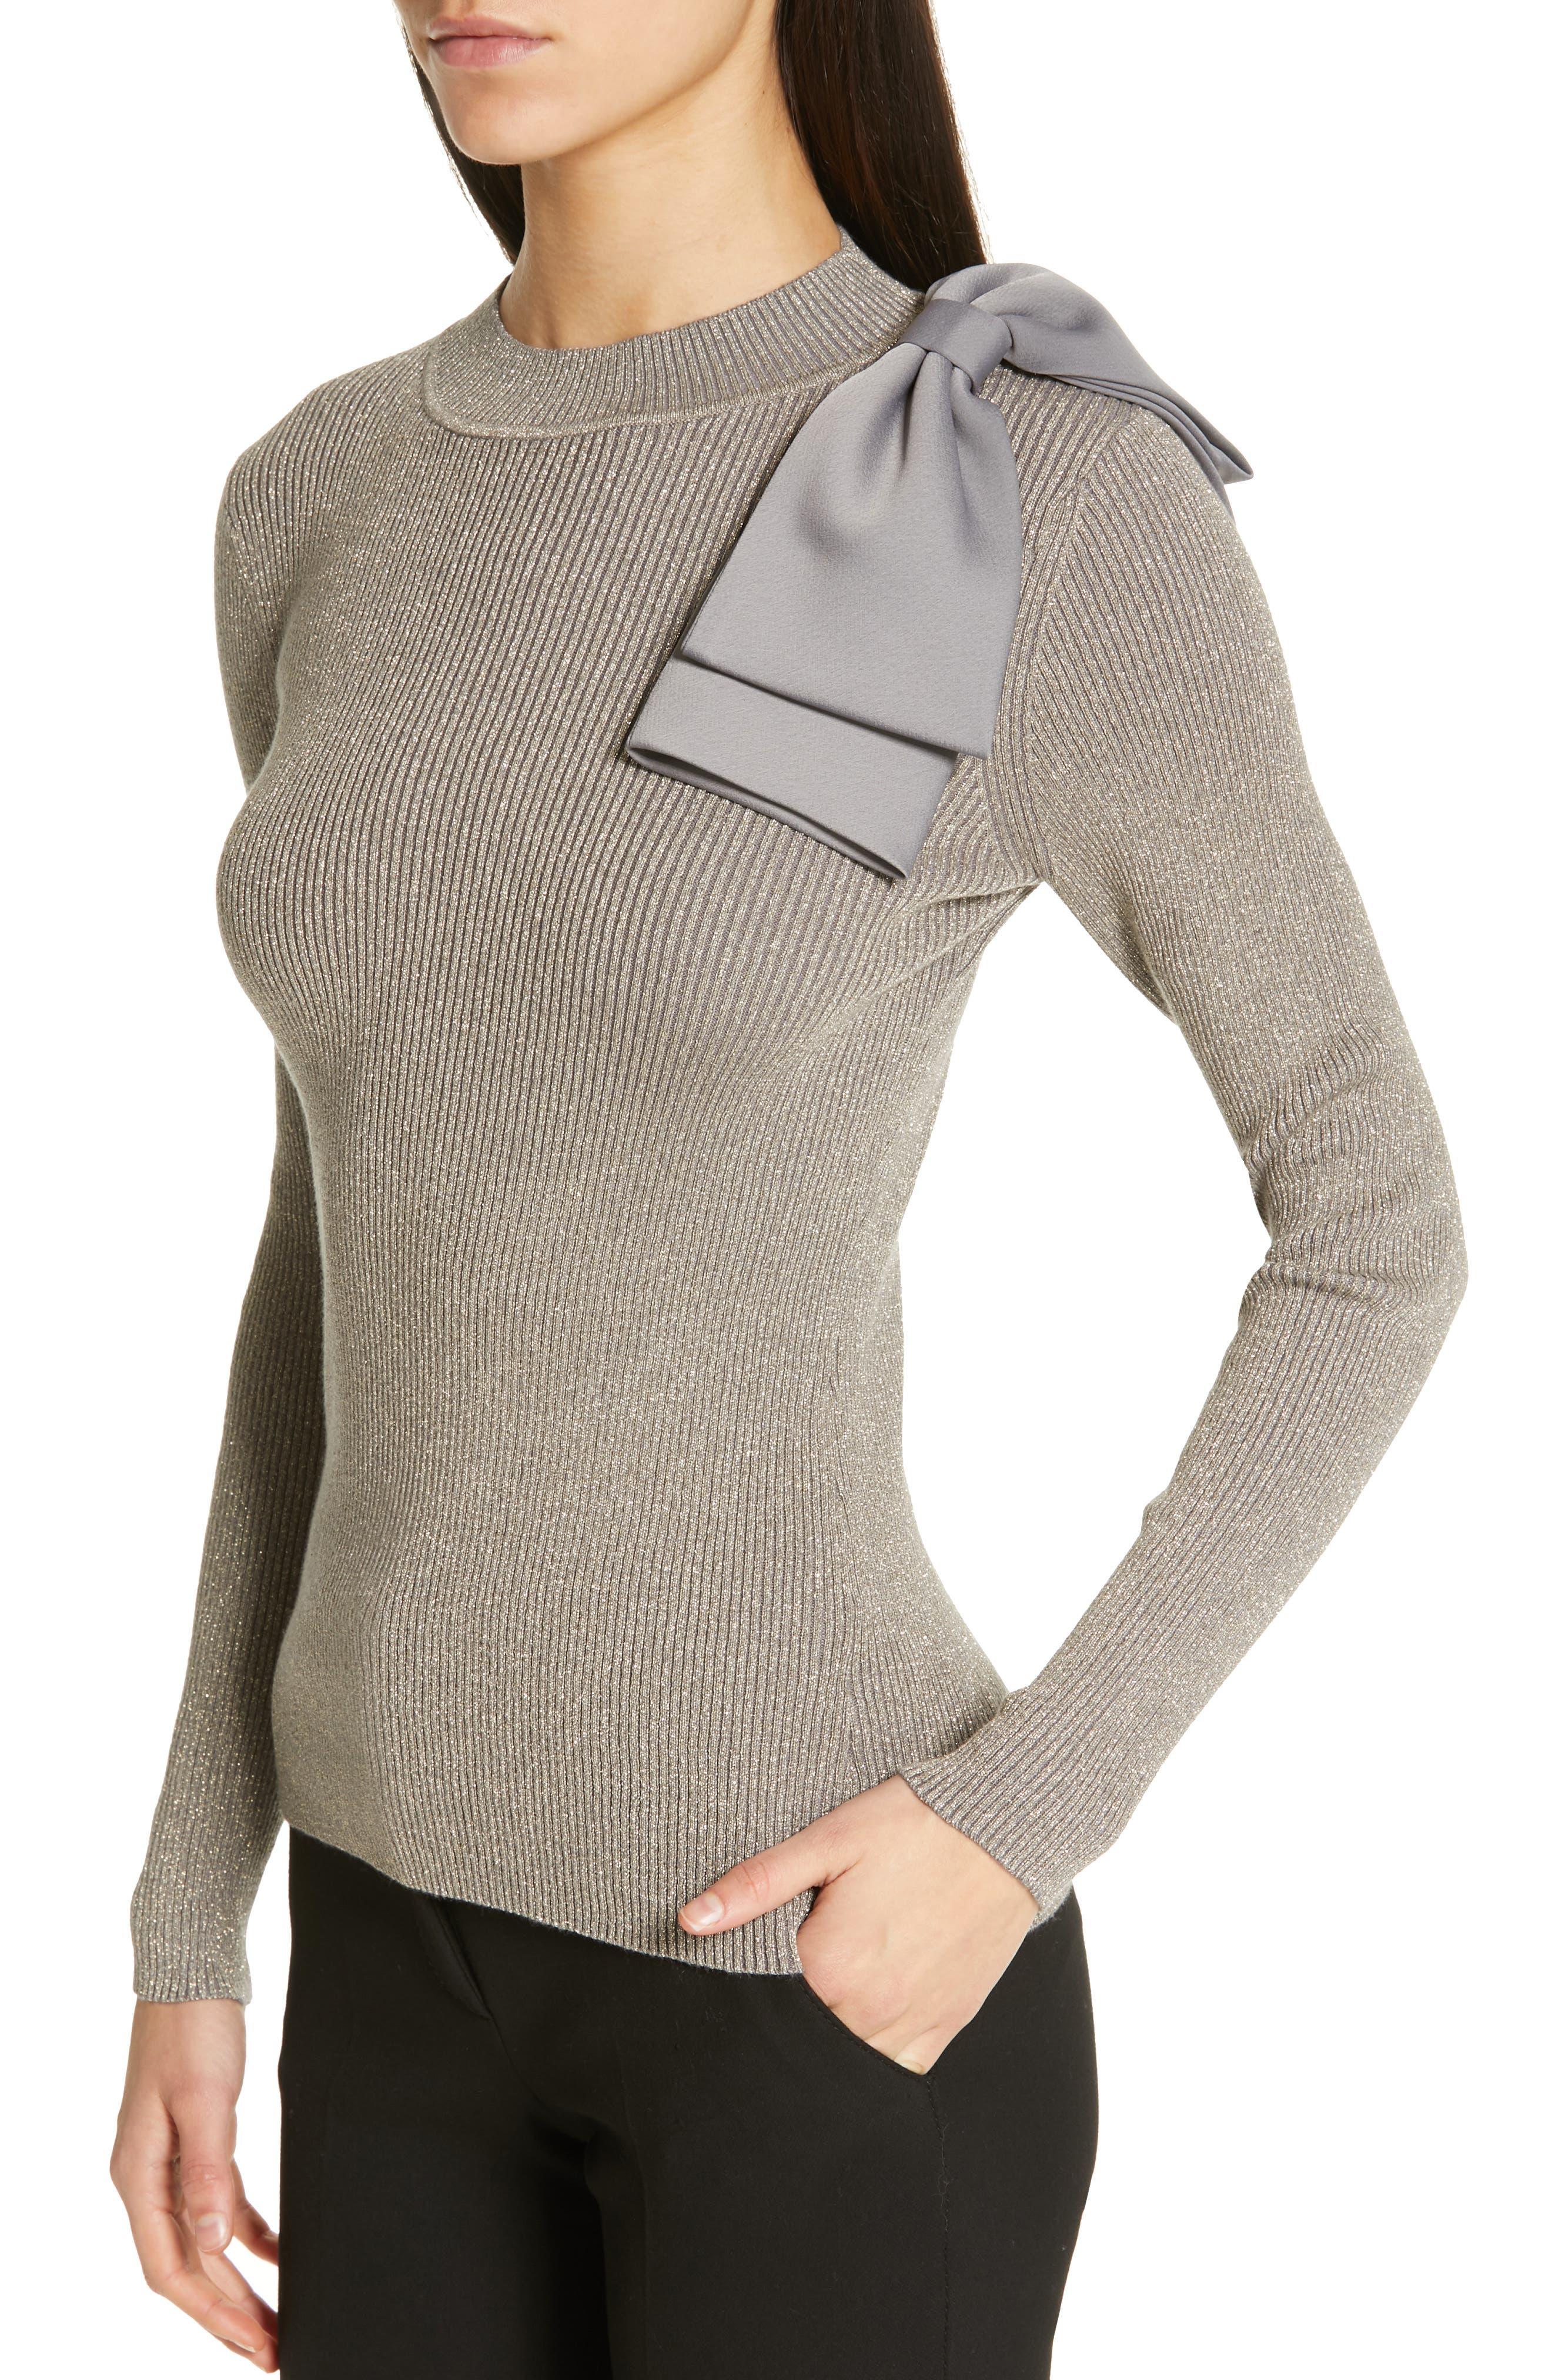 Saaydie Bow Trim Metallic Sweater,                             Alternate thumbnail 4, color,                             CHARCOAL